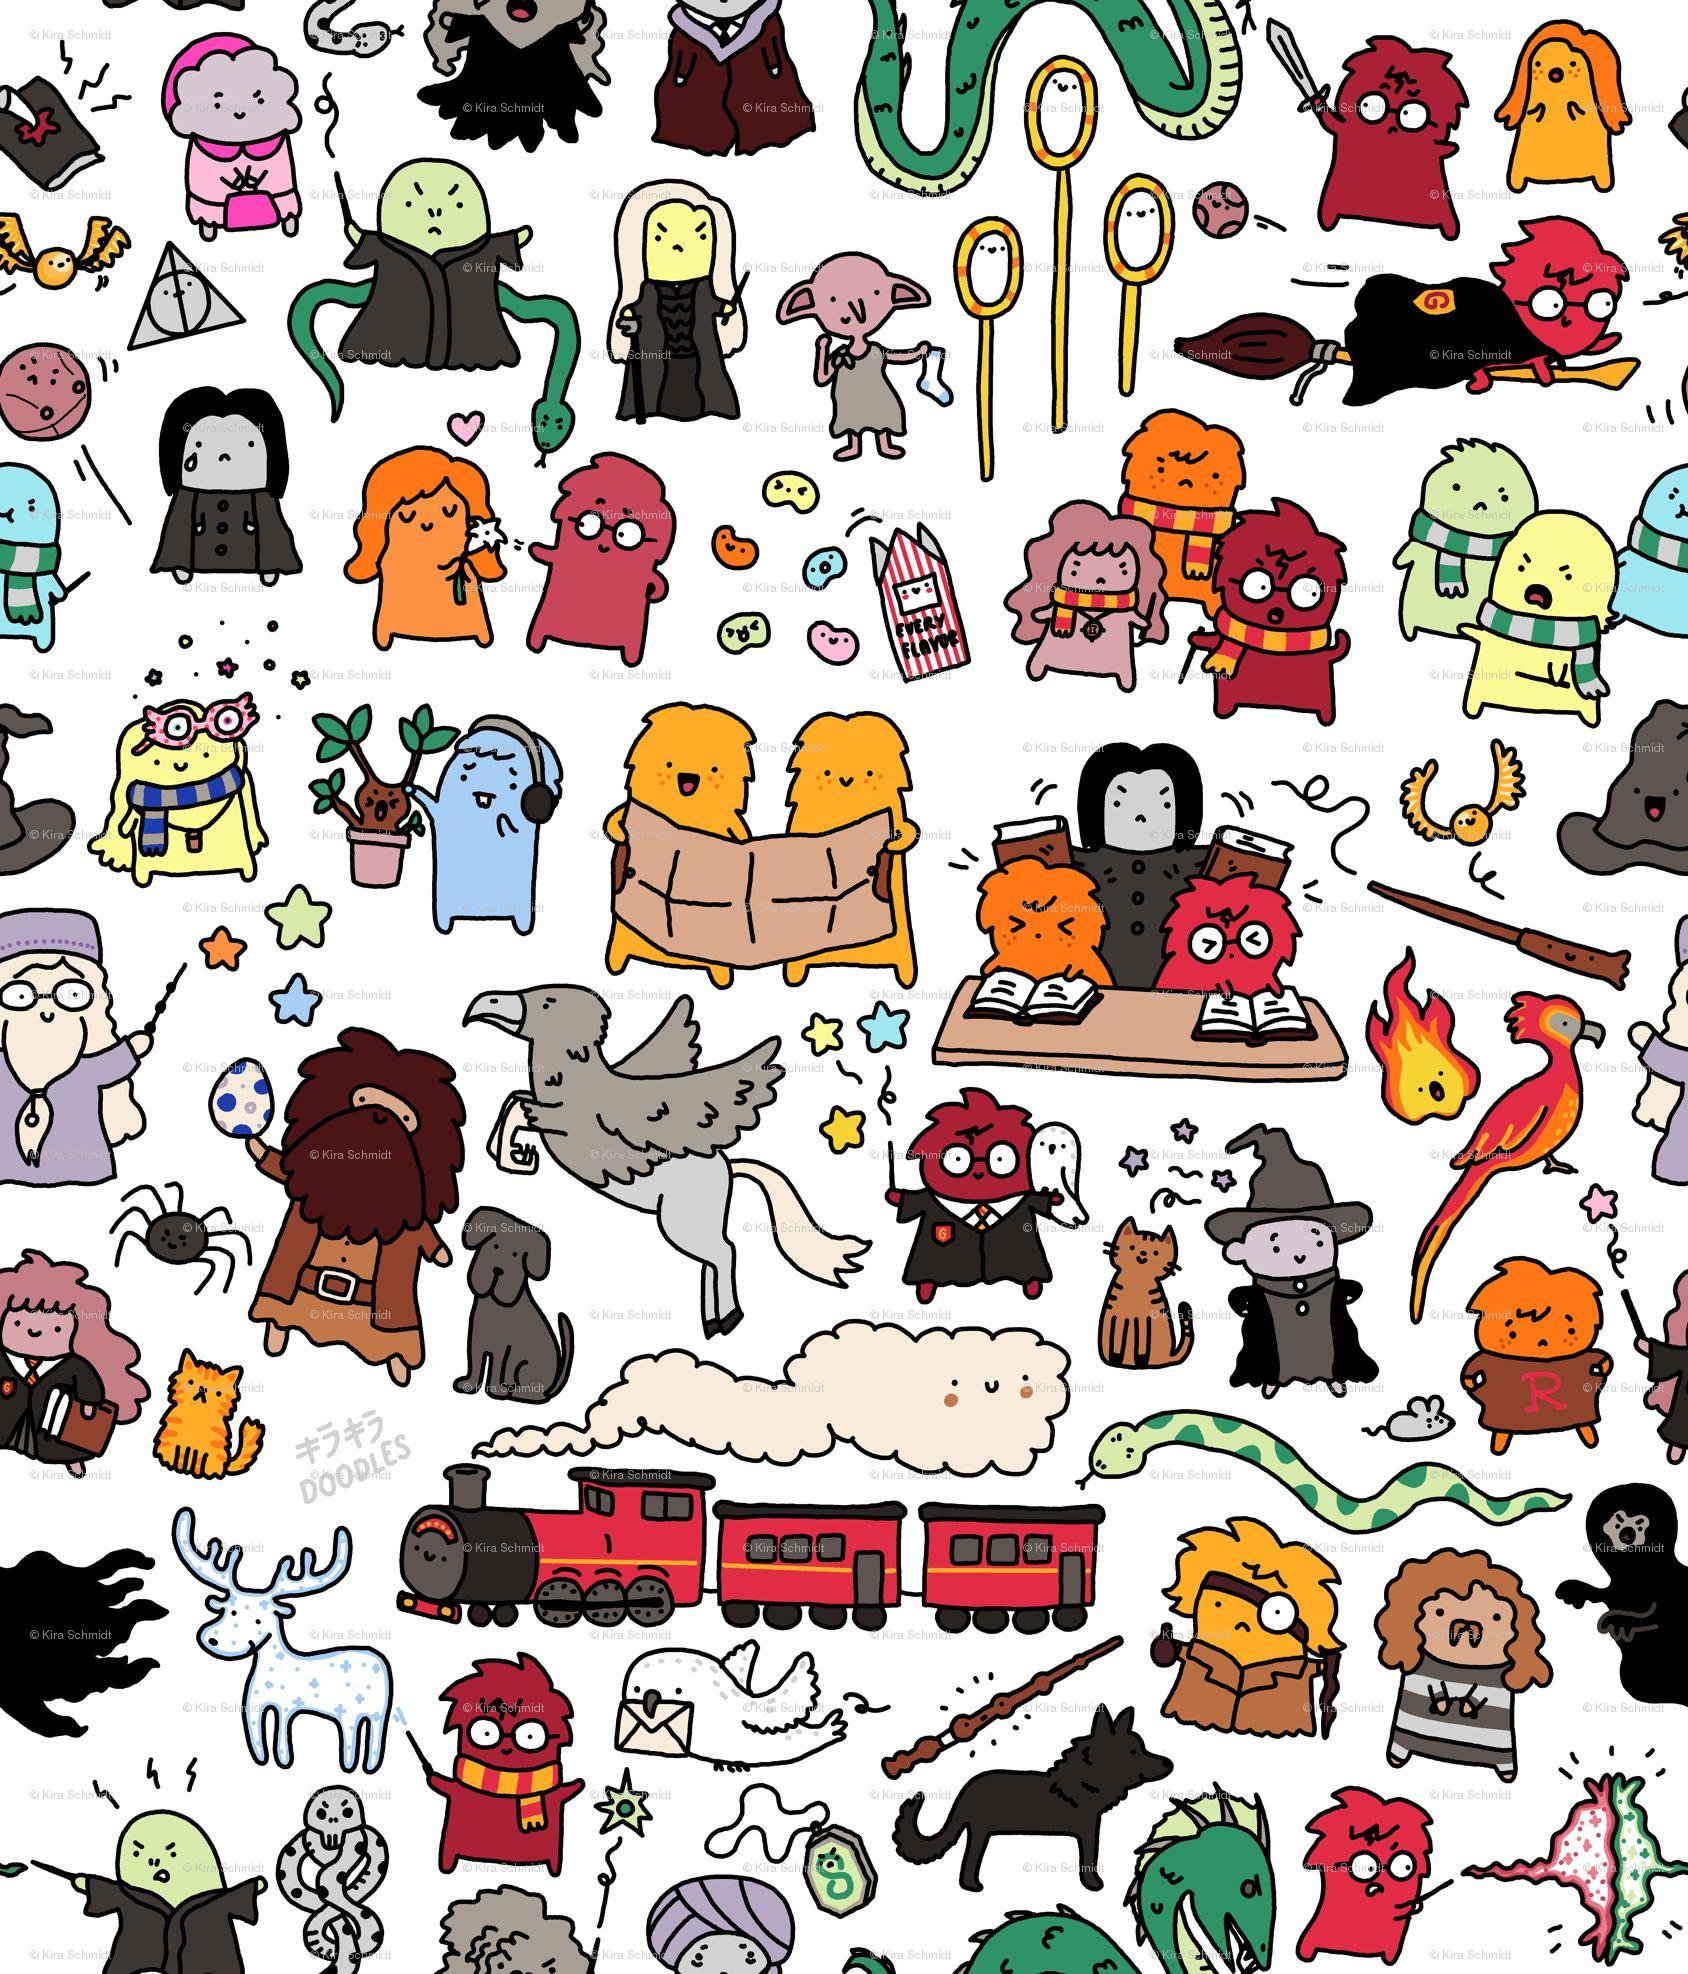 Unduh 8000 Wallpaper Hp Cartoon HD Gratis